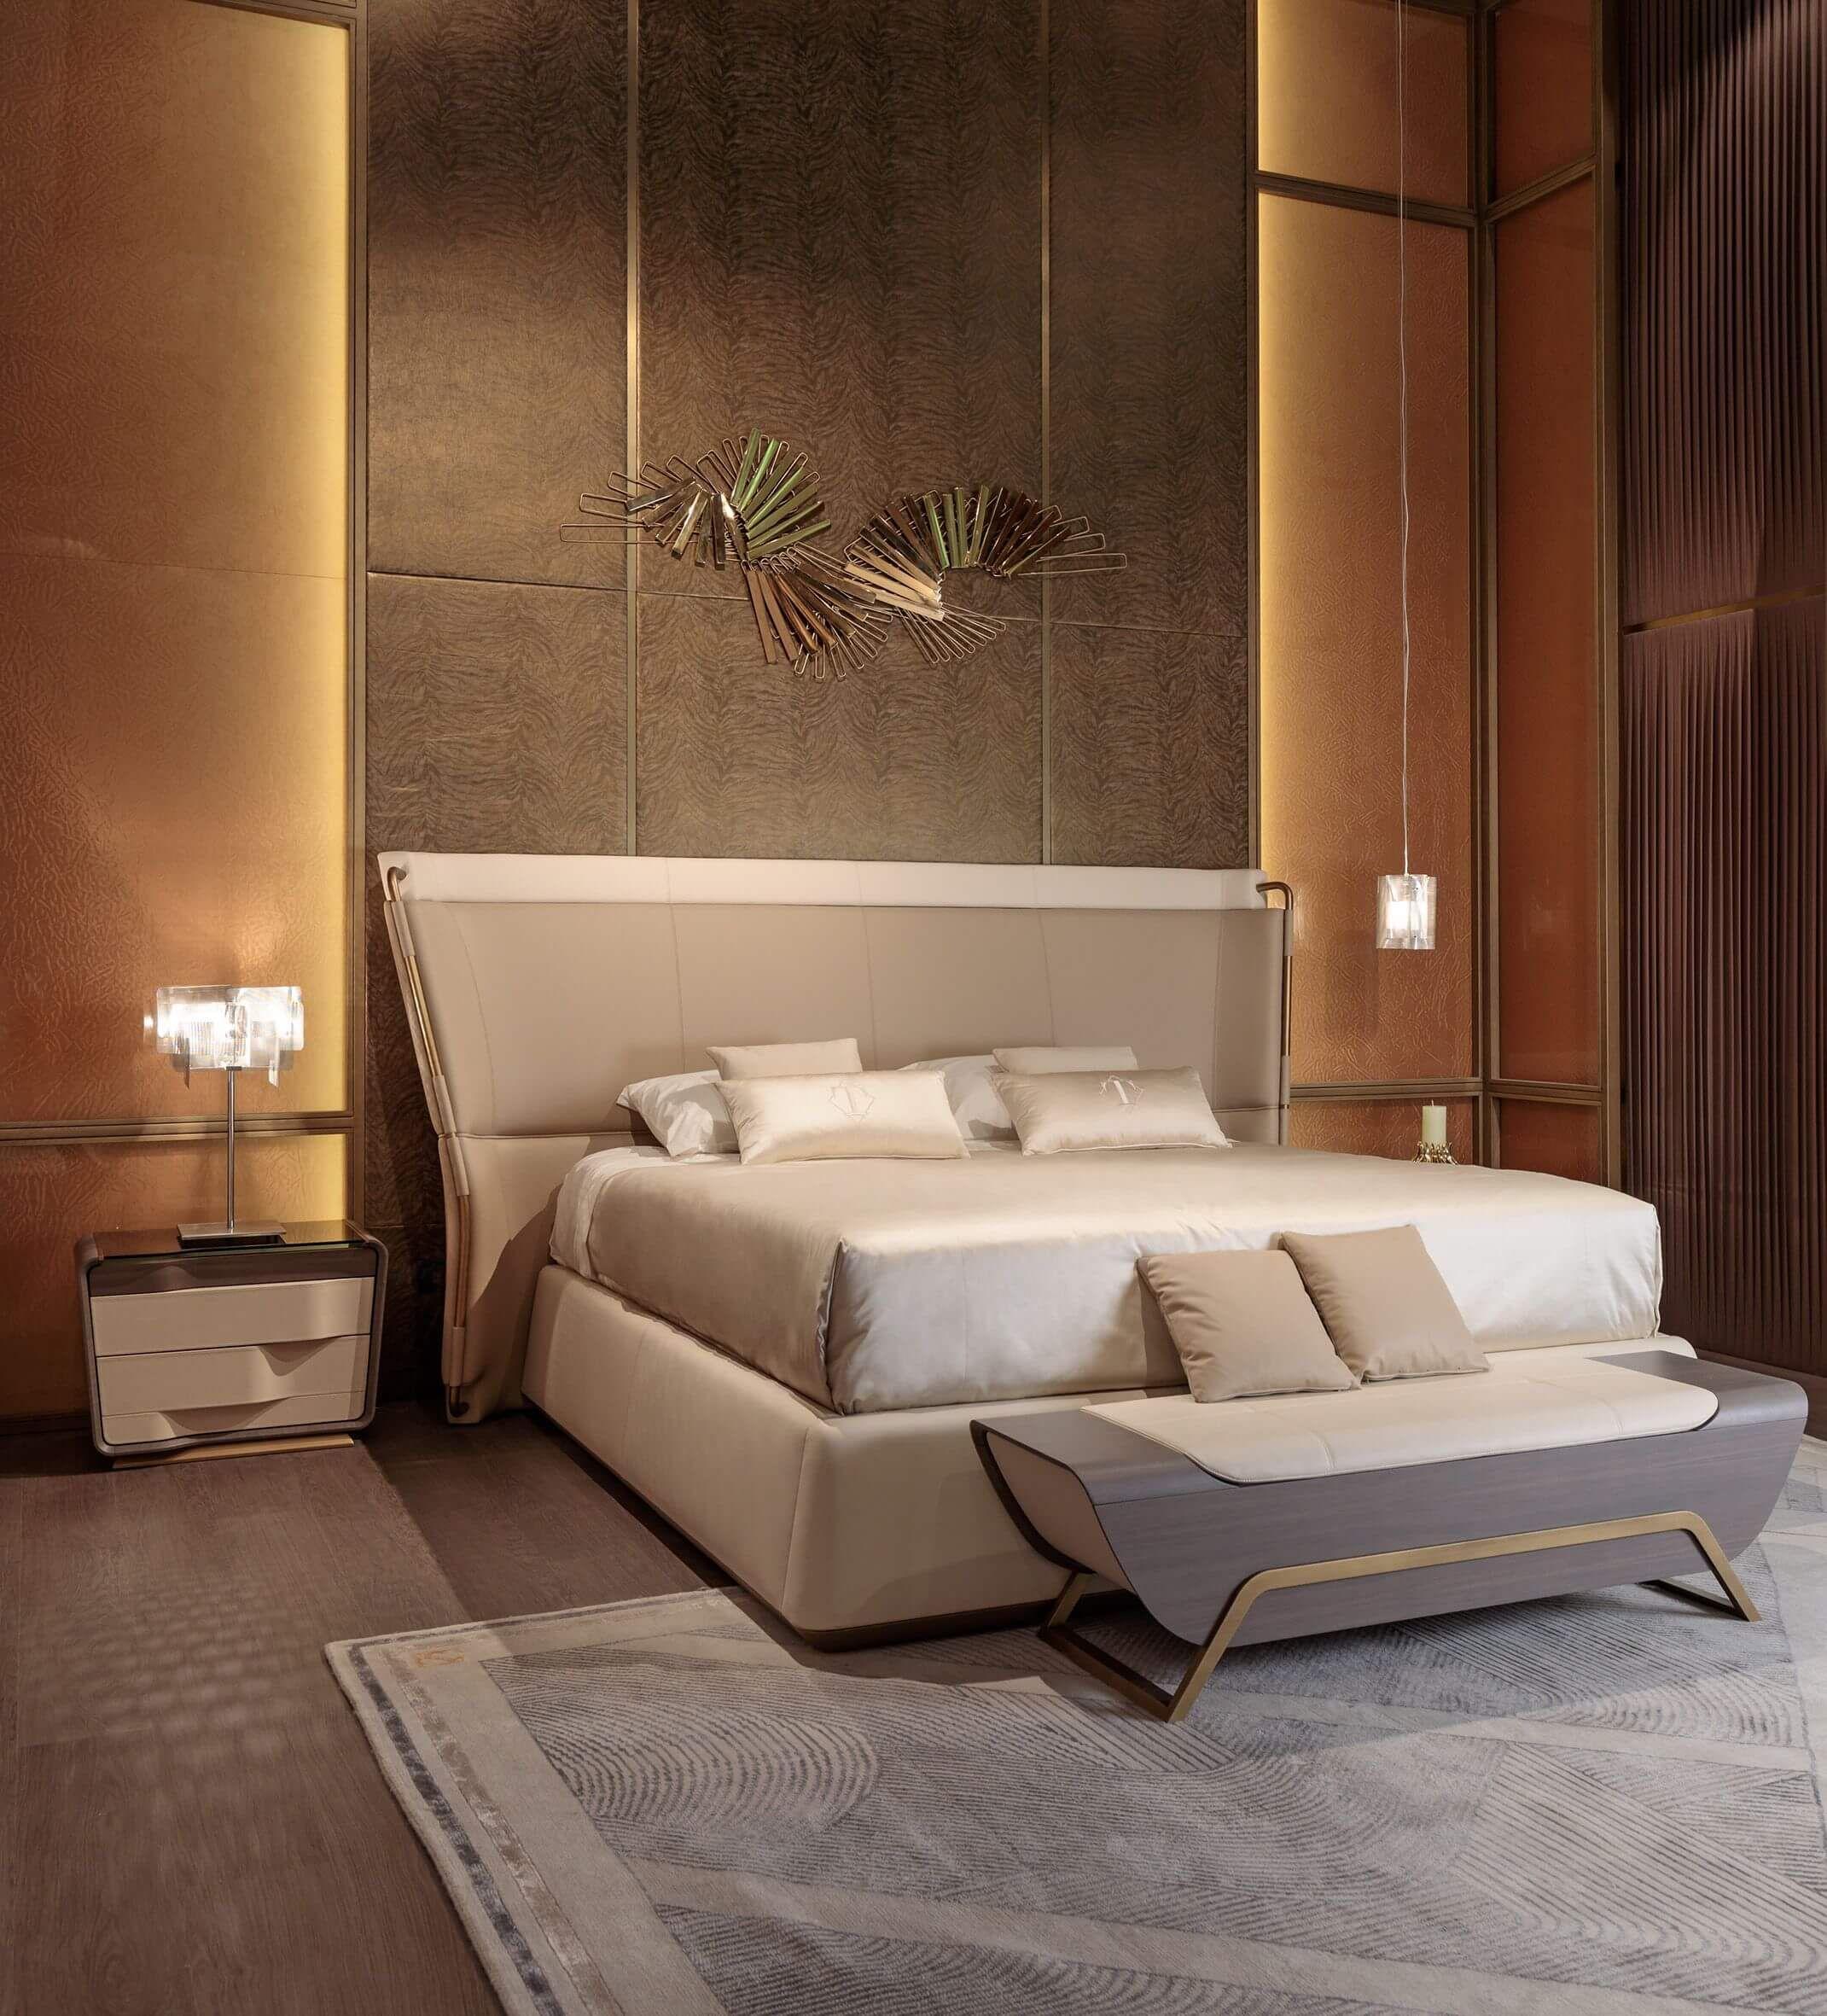 55 Cozy Master Bedroom Ideas 2020 For Your Inspiration Dovenda In 2020 Luxury Bedroom Furniture Contemporary Bedroom Design Luxurious Bedrooms